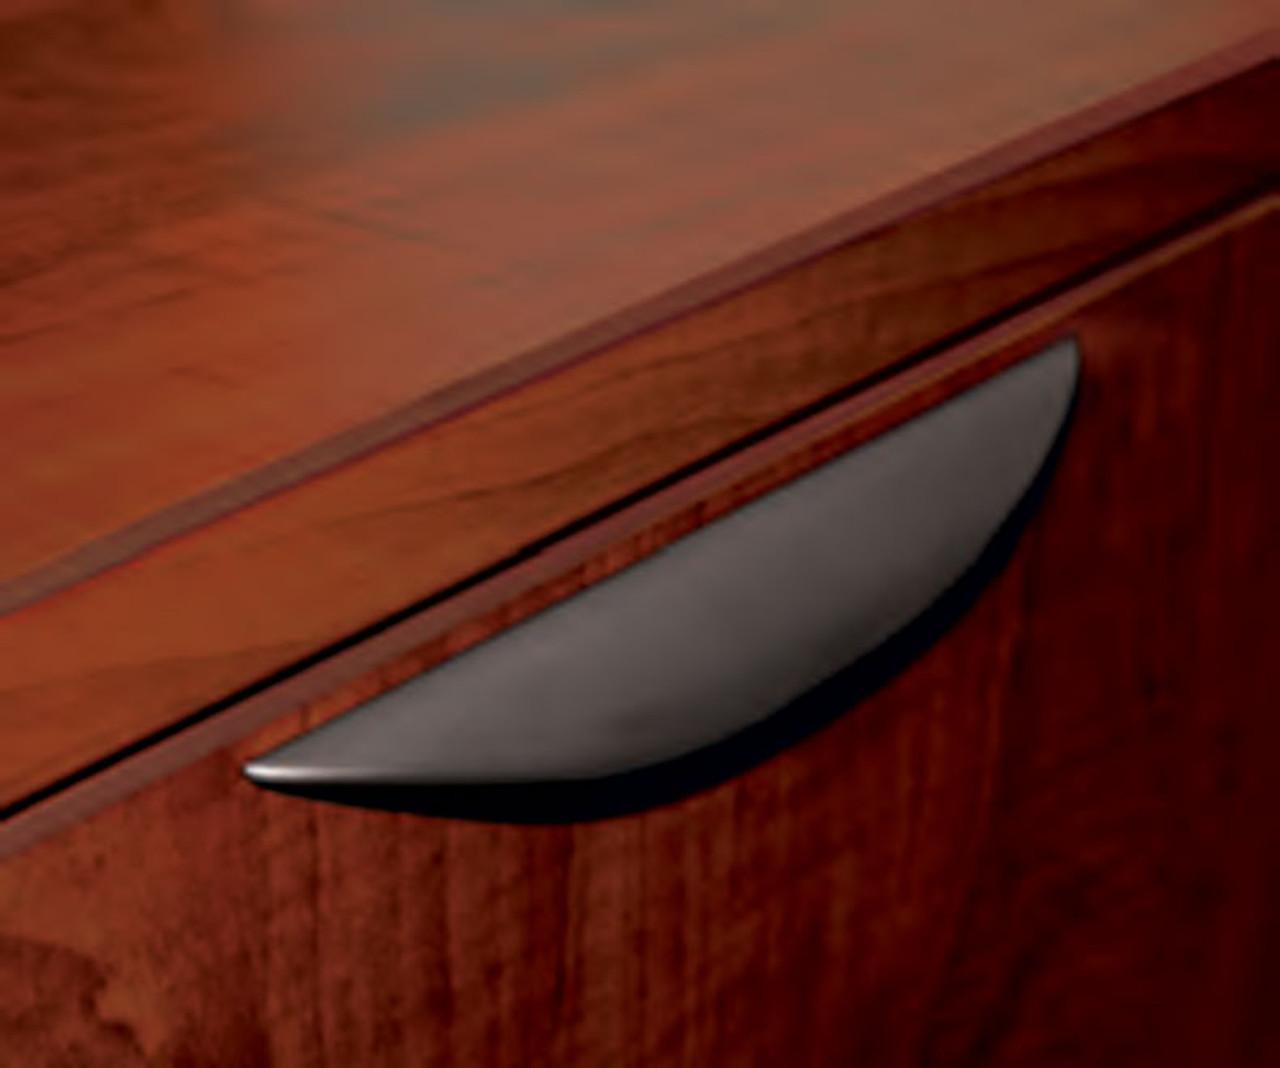 One Person Workstation w/Acrylic Aluminum Privacy Panel, #OT-SUL-HPB25